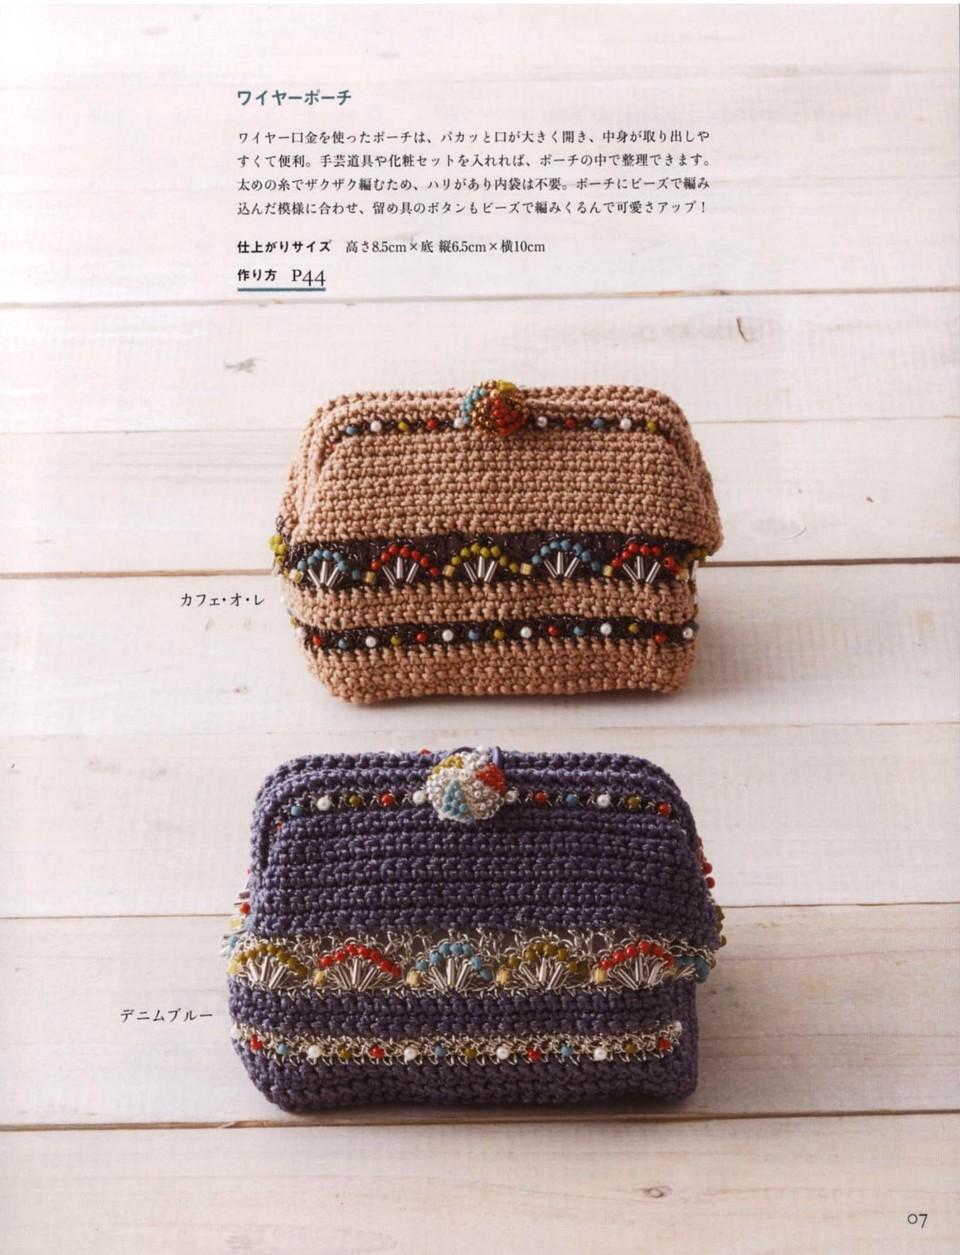 717 Beads Crochet 17-08